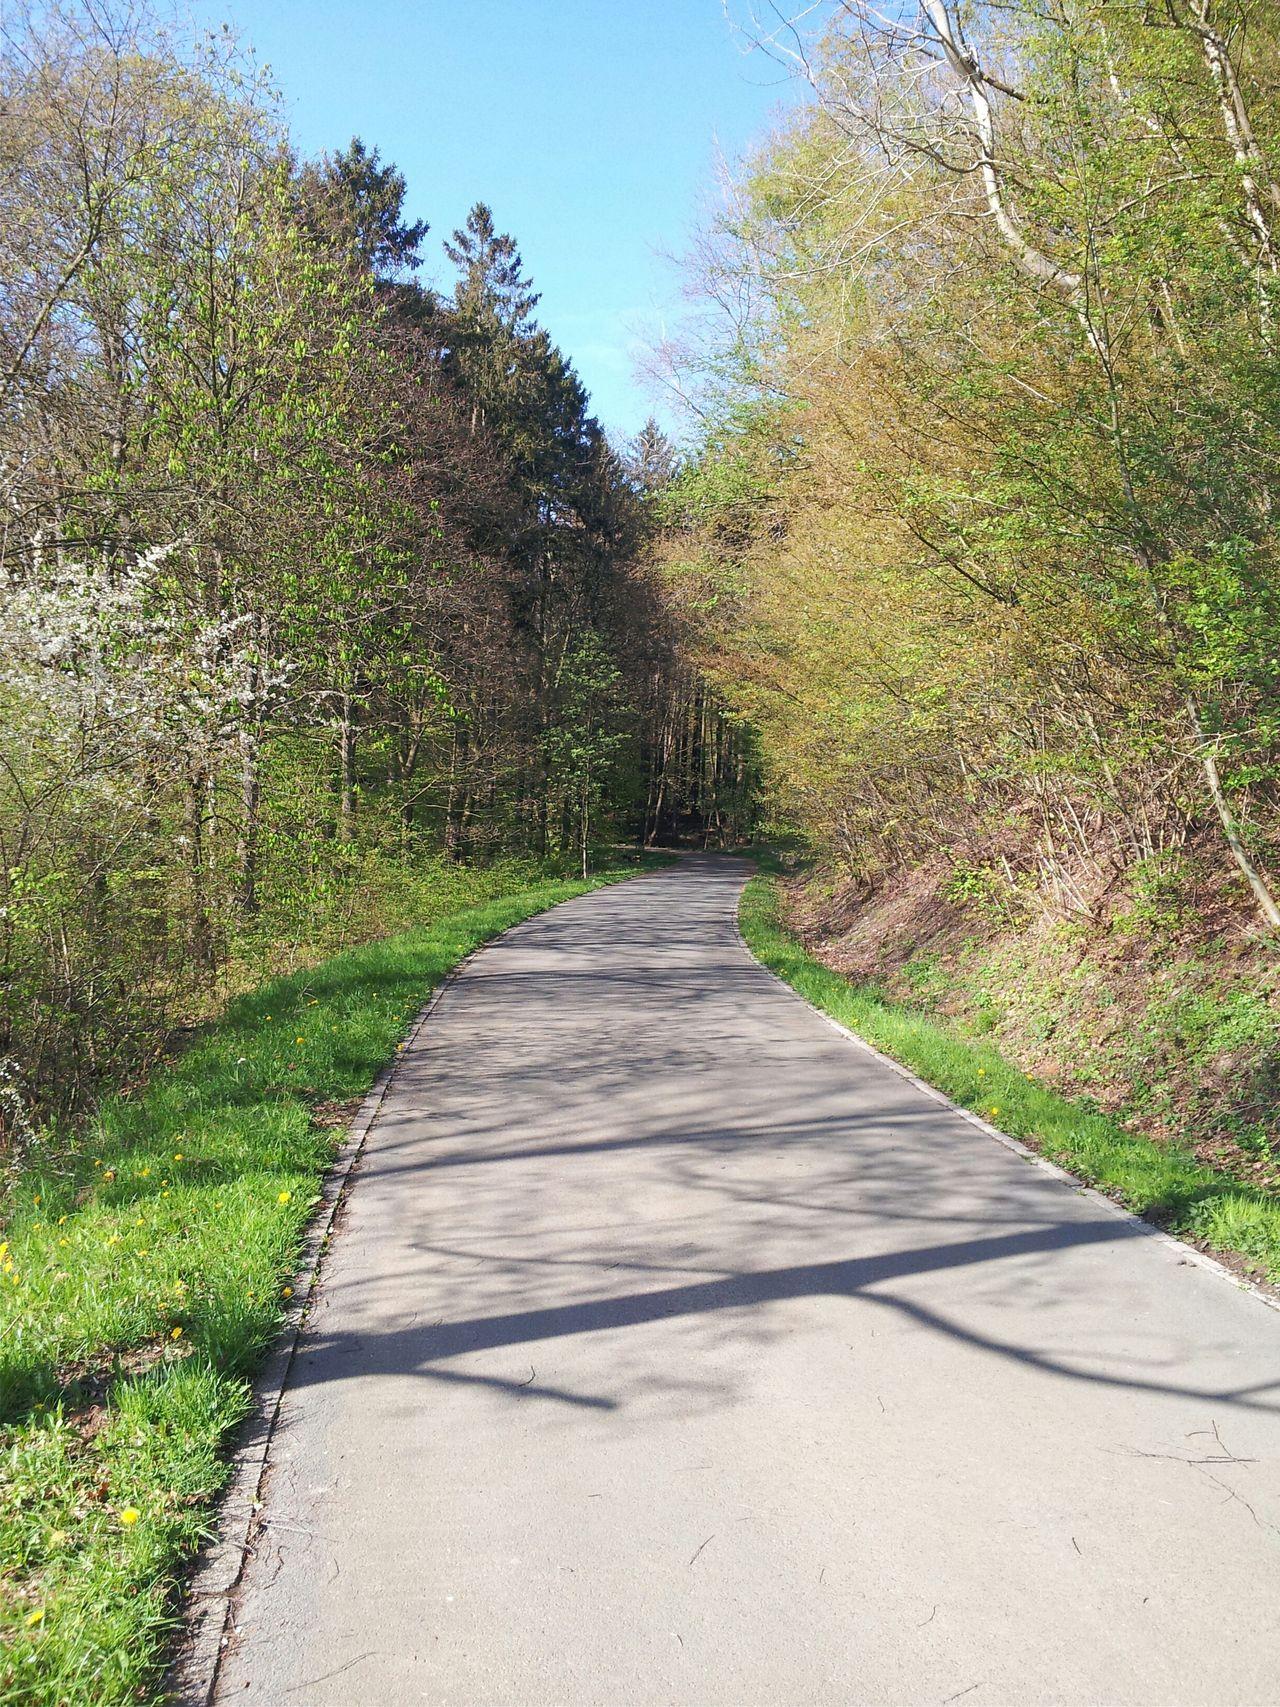 Biking Lovely Weather Enjoying The Sun Peace And Quiet Hello World Enjoying Life